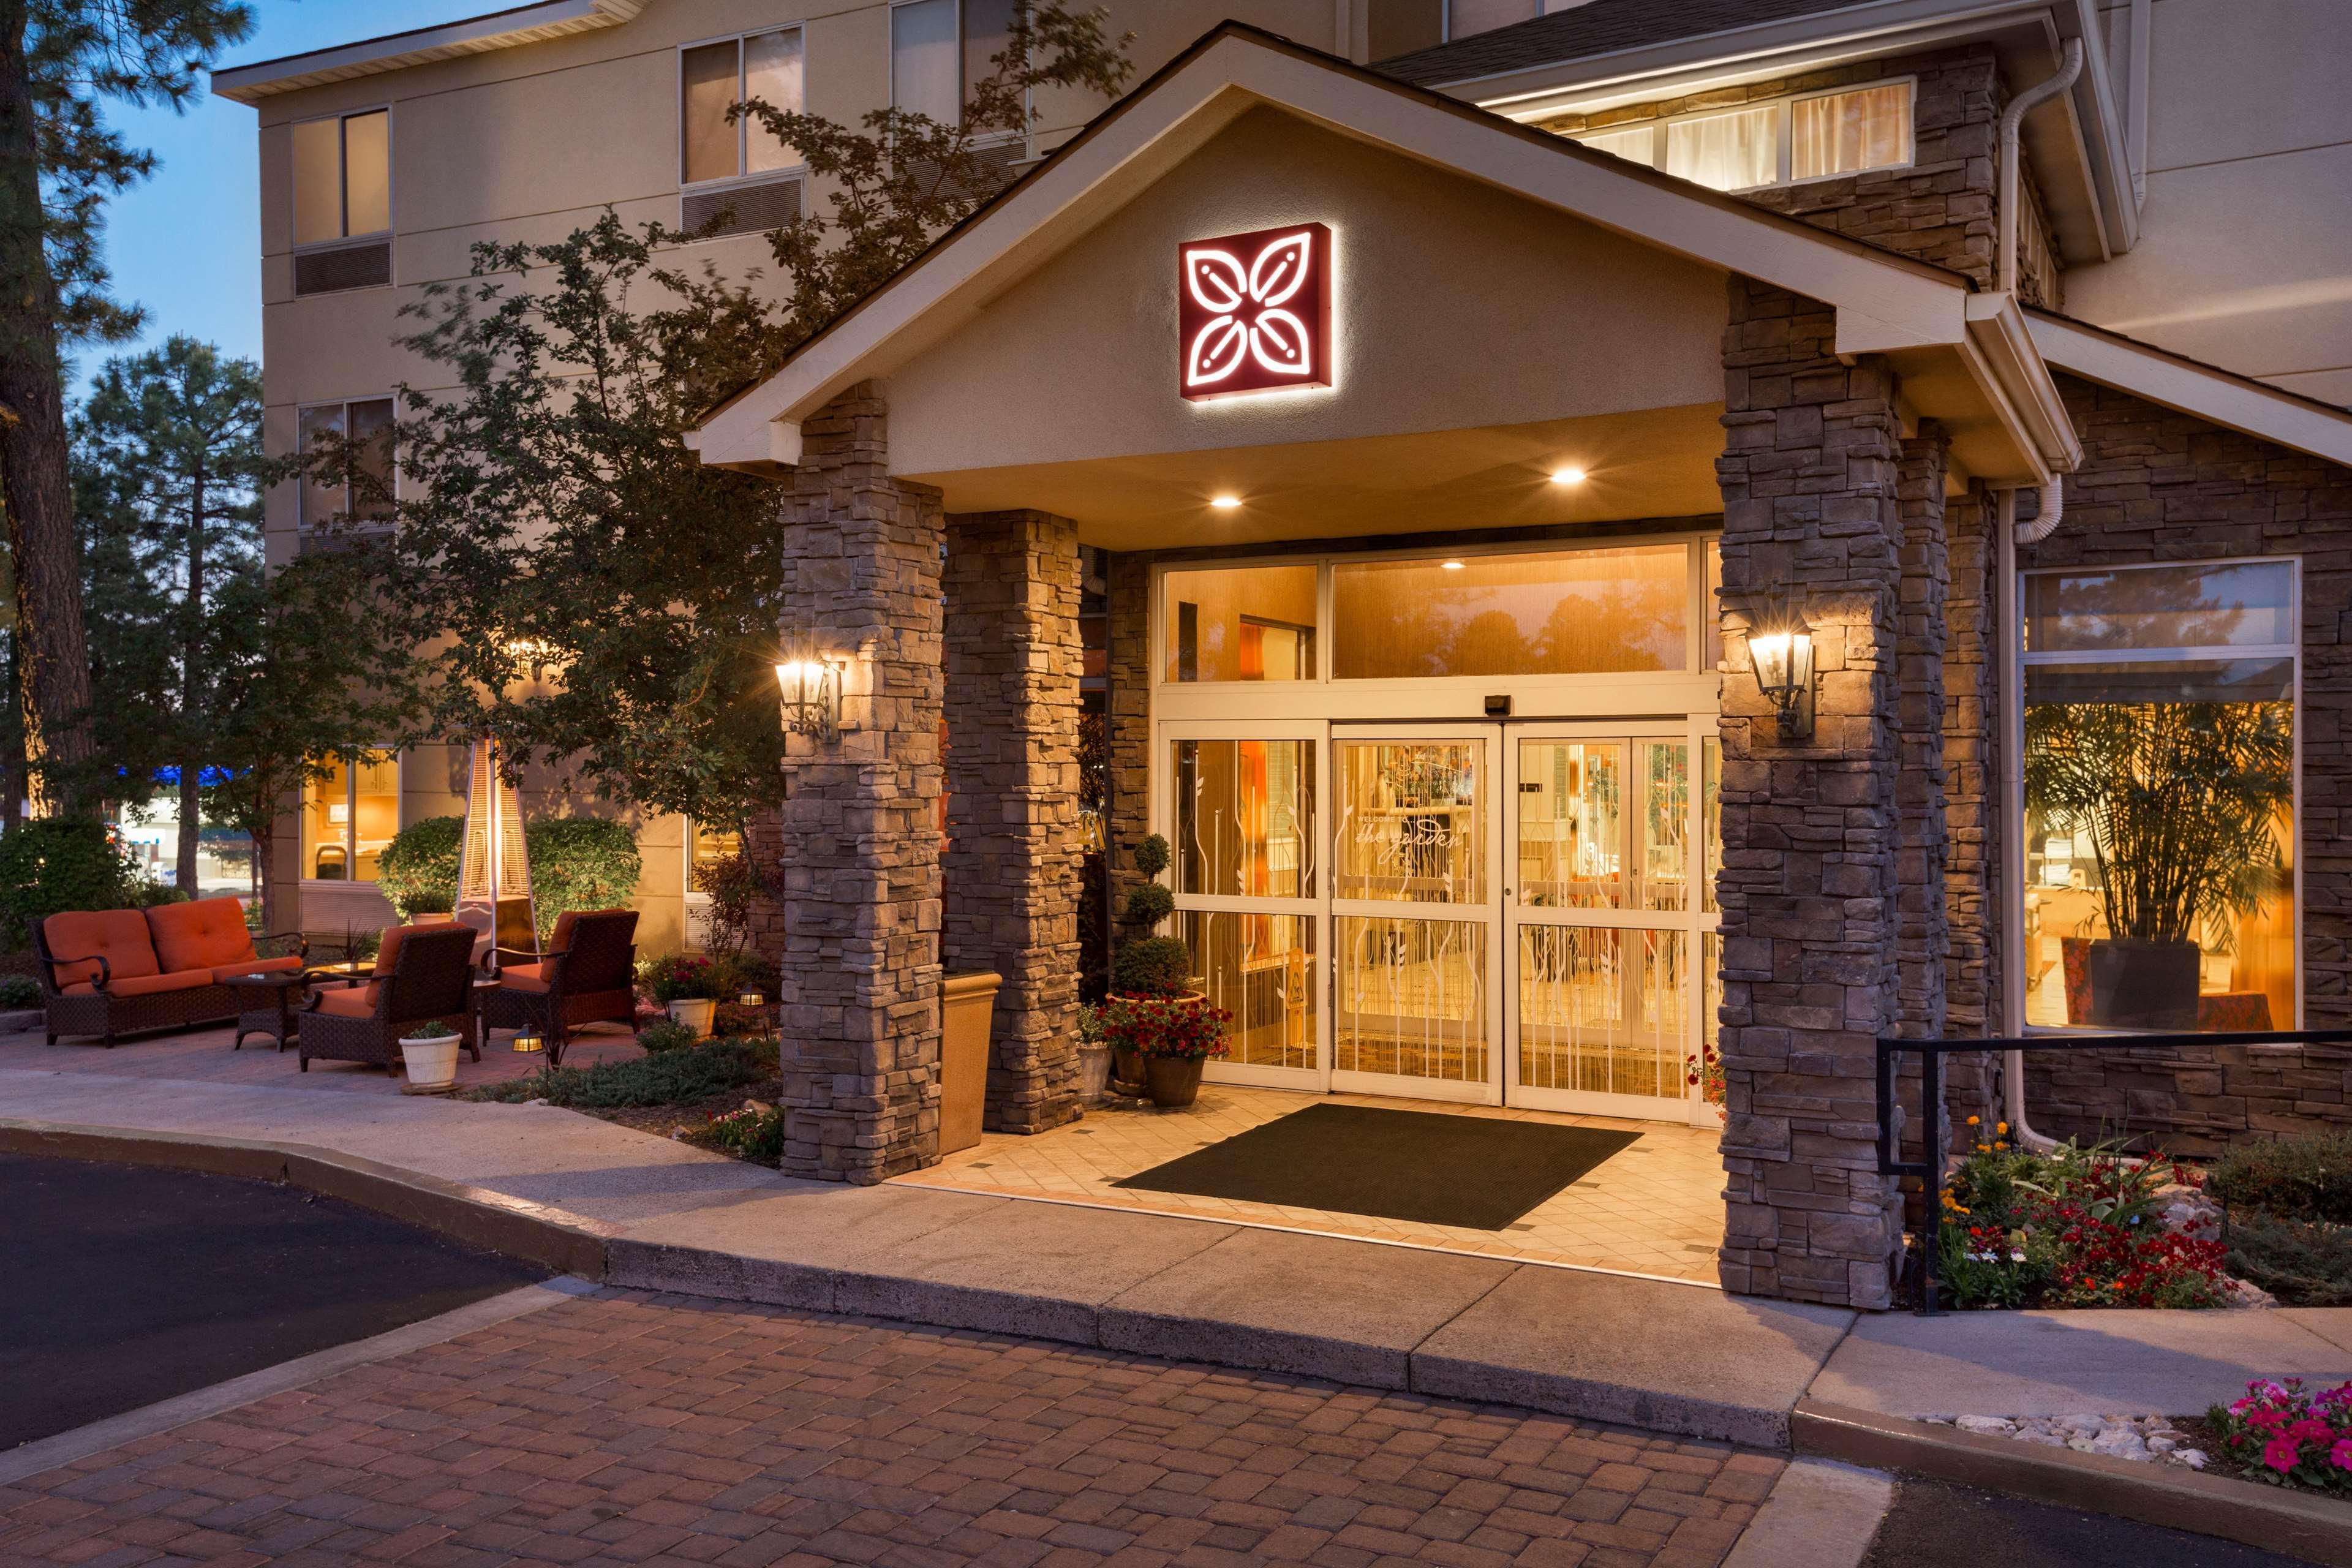 Hilton Garden Inn Flagstaff In Flagstaff Az Hotels Motels 928 226 8888